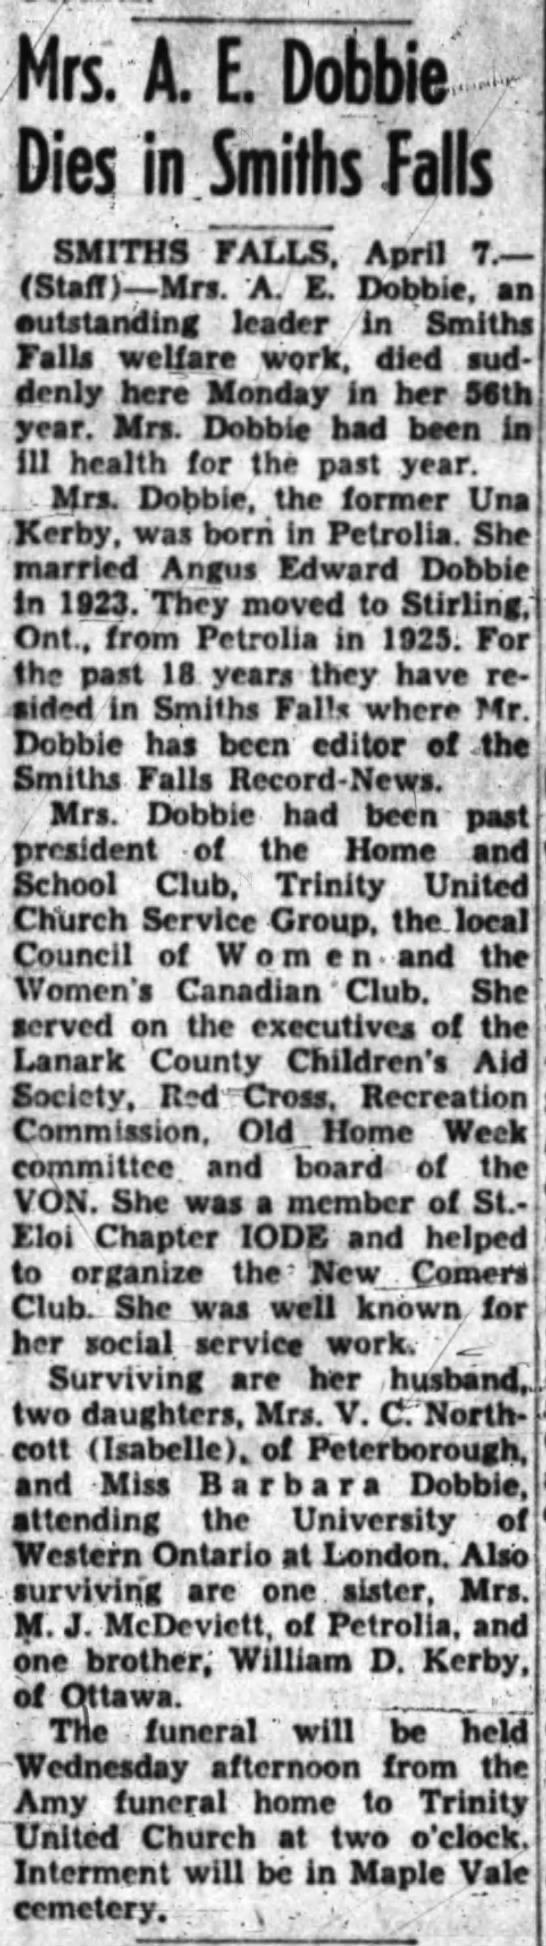 Mrs. Dobbie nee Kerby of Petrolia Dies - Mrs. A. E. Dobbfe' Dies in Smiths Palls SMITHS...